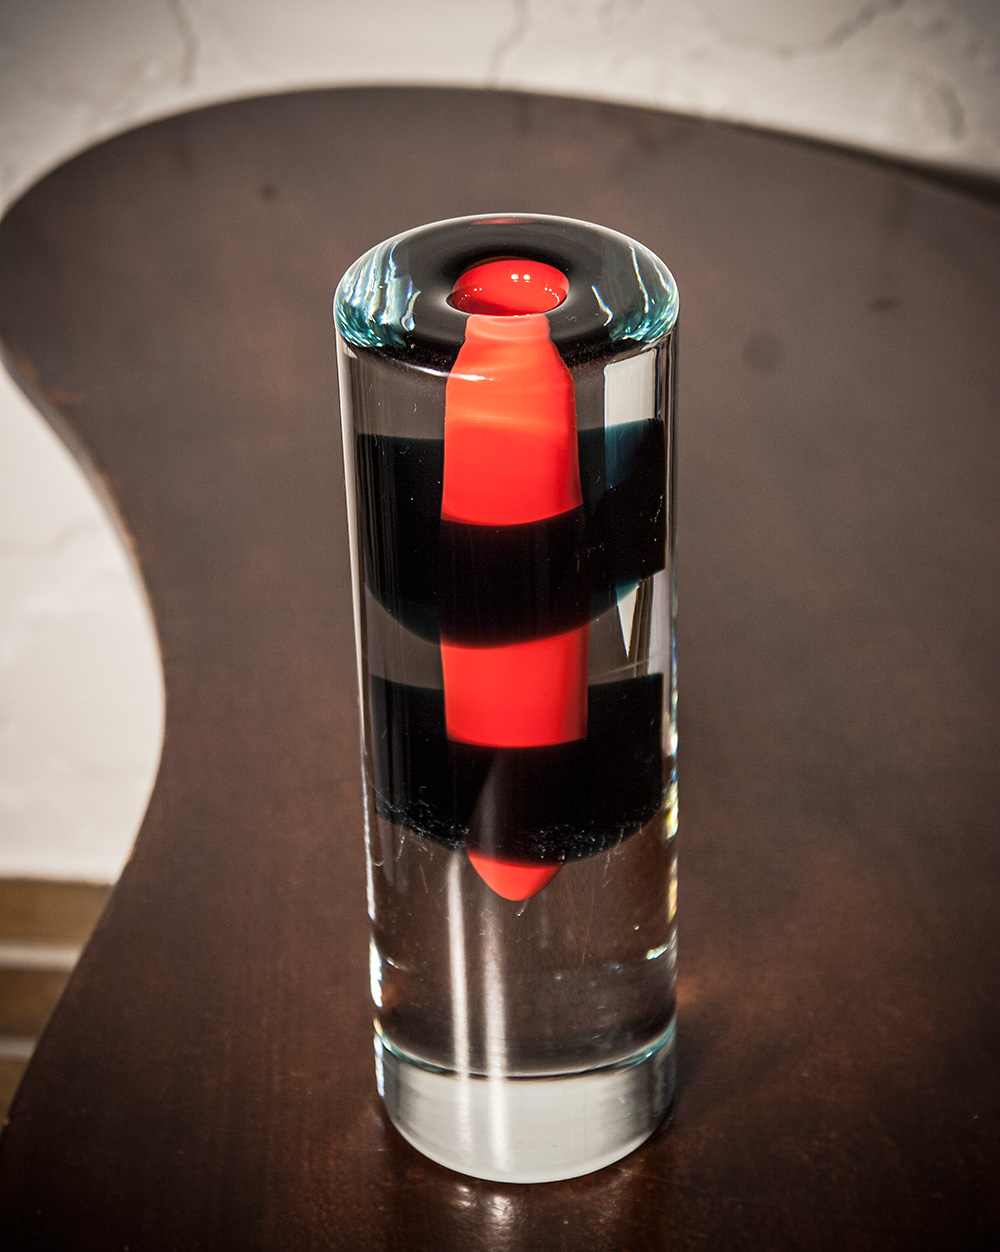 Beranek glass vase by Vladimir Dostal